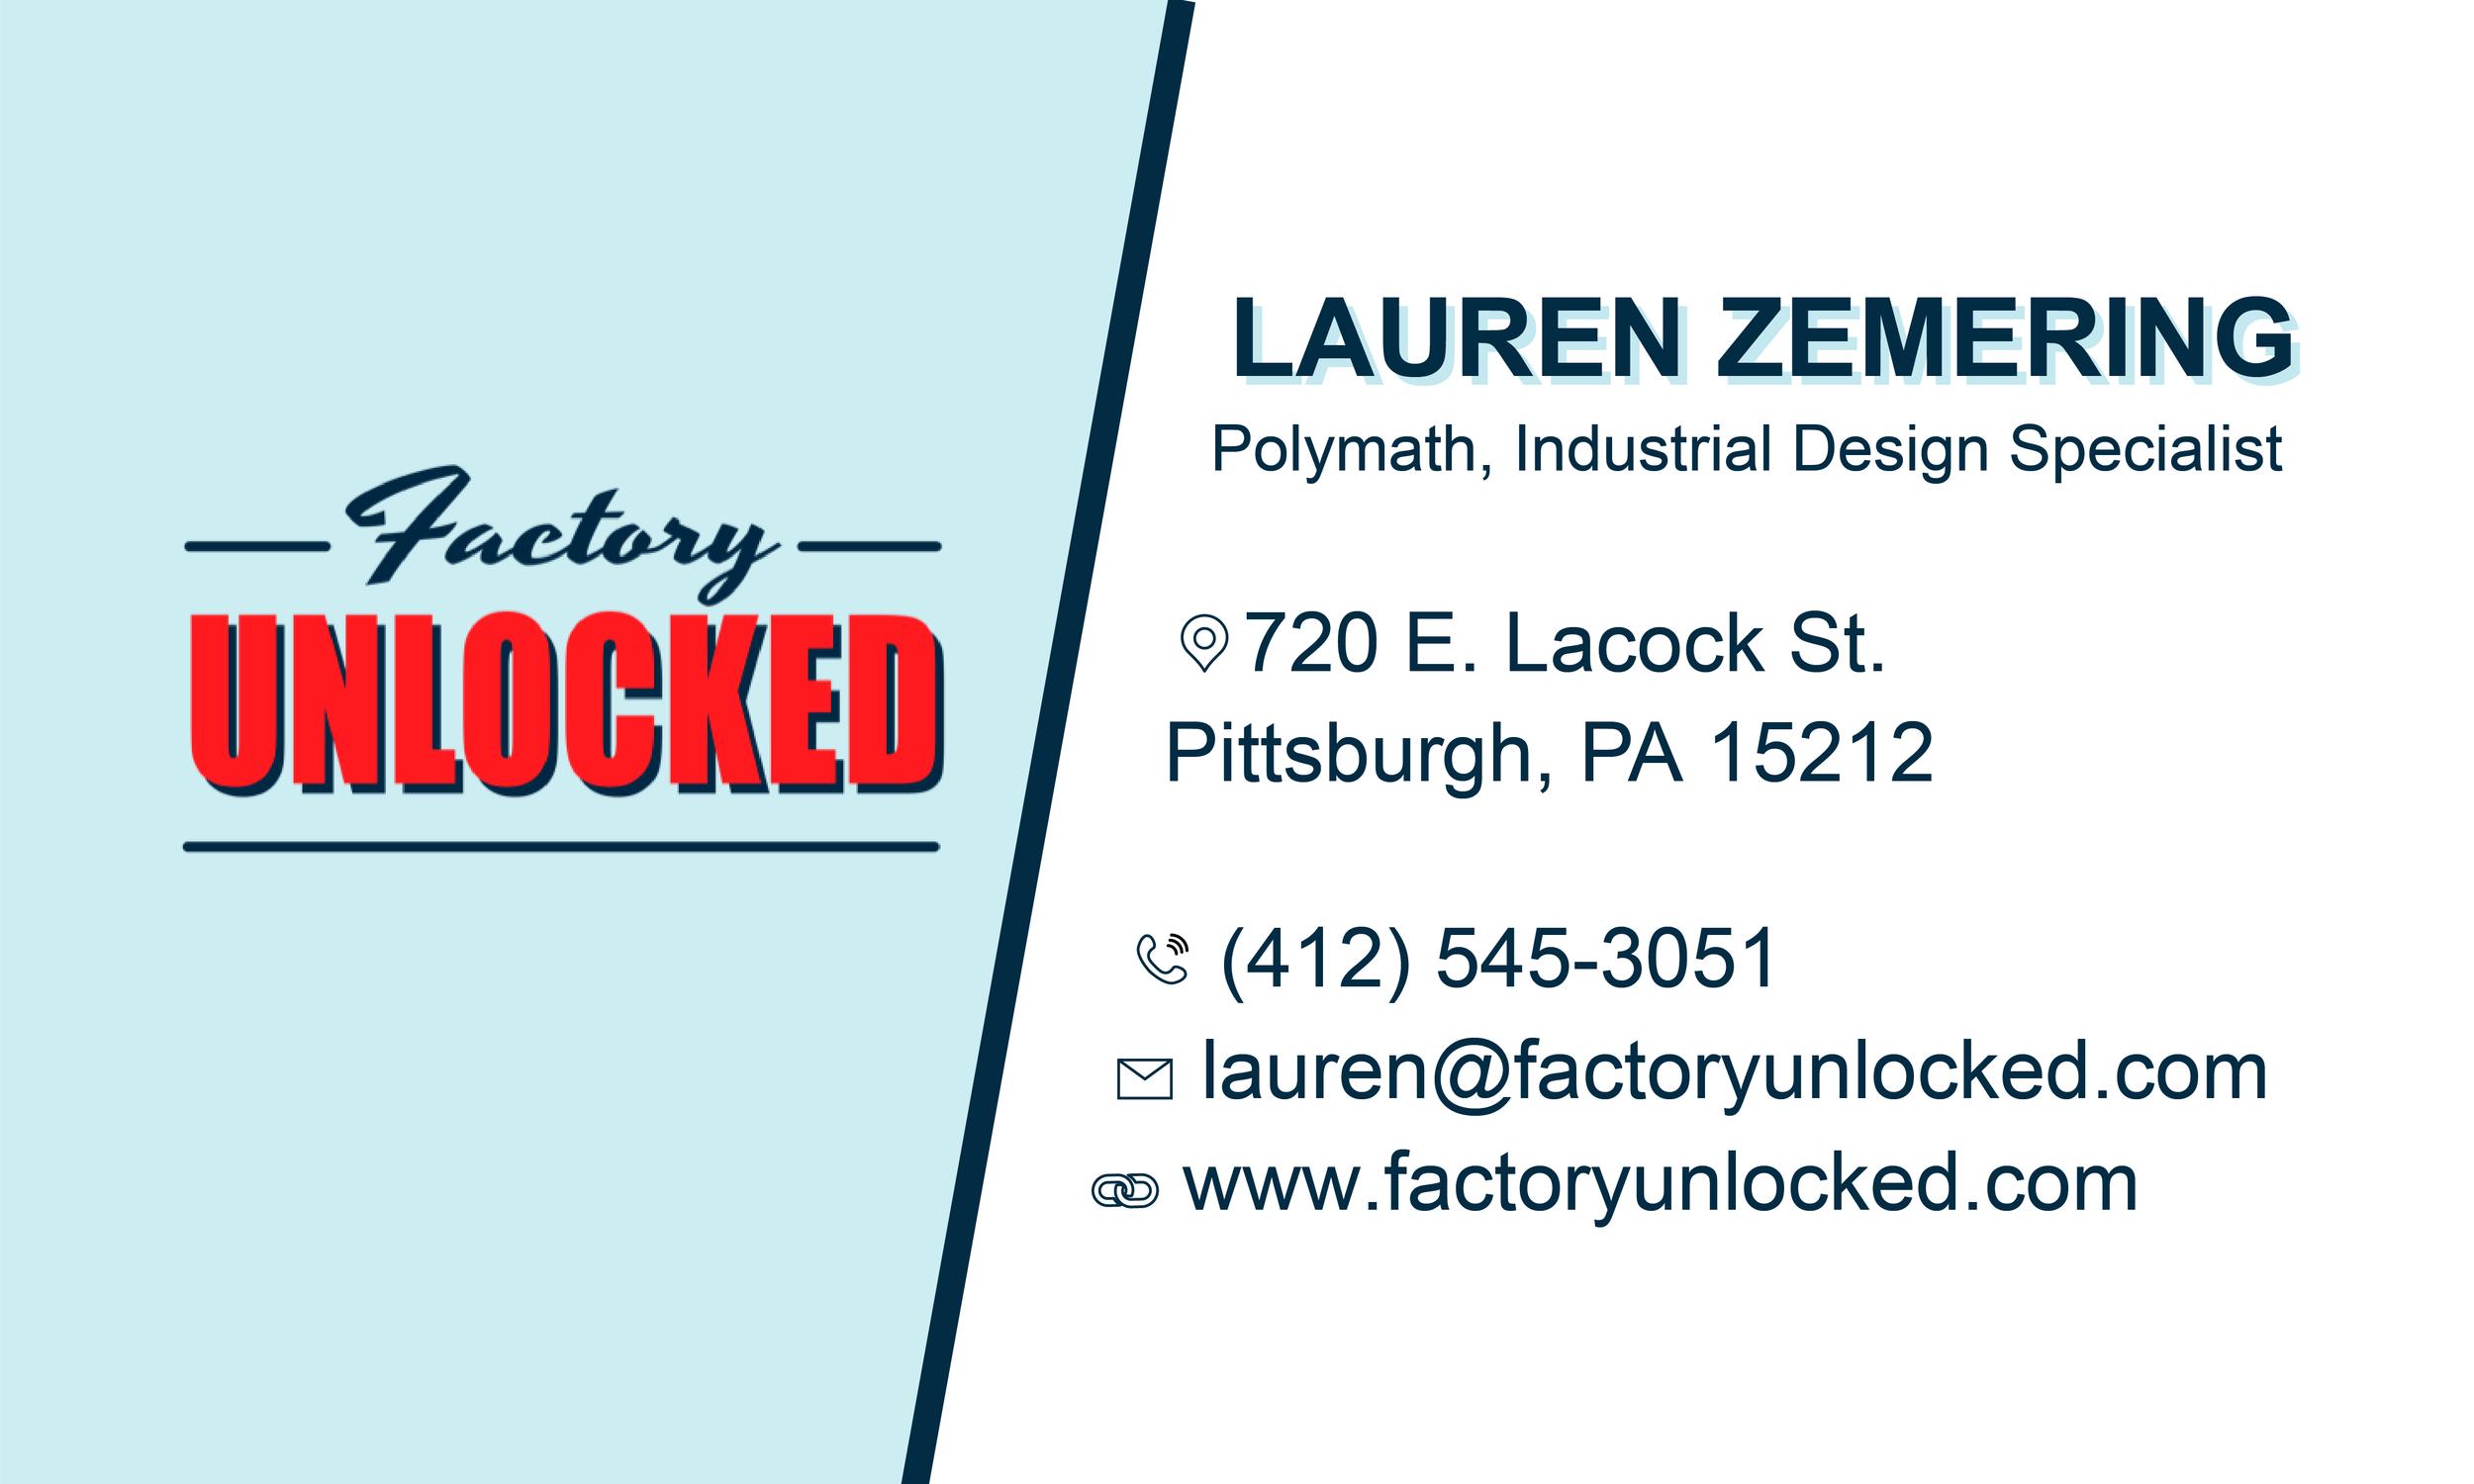 Lauren Business Card-06-06.png